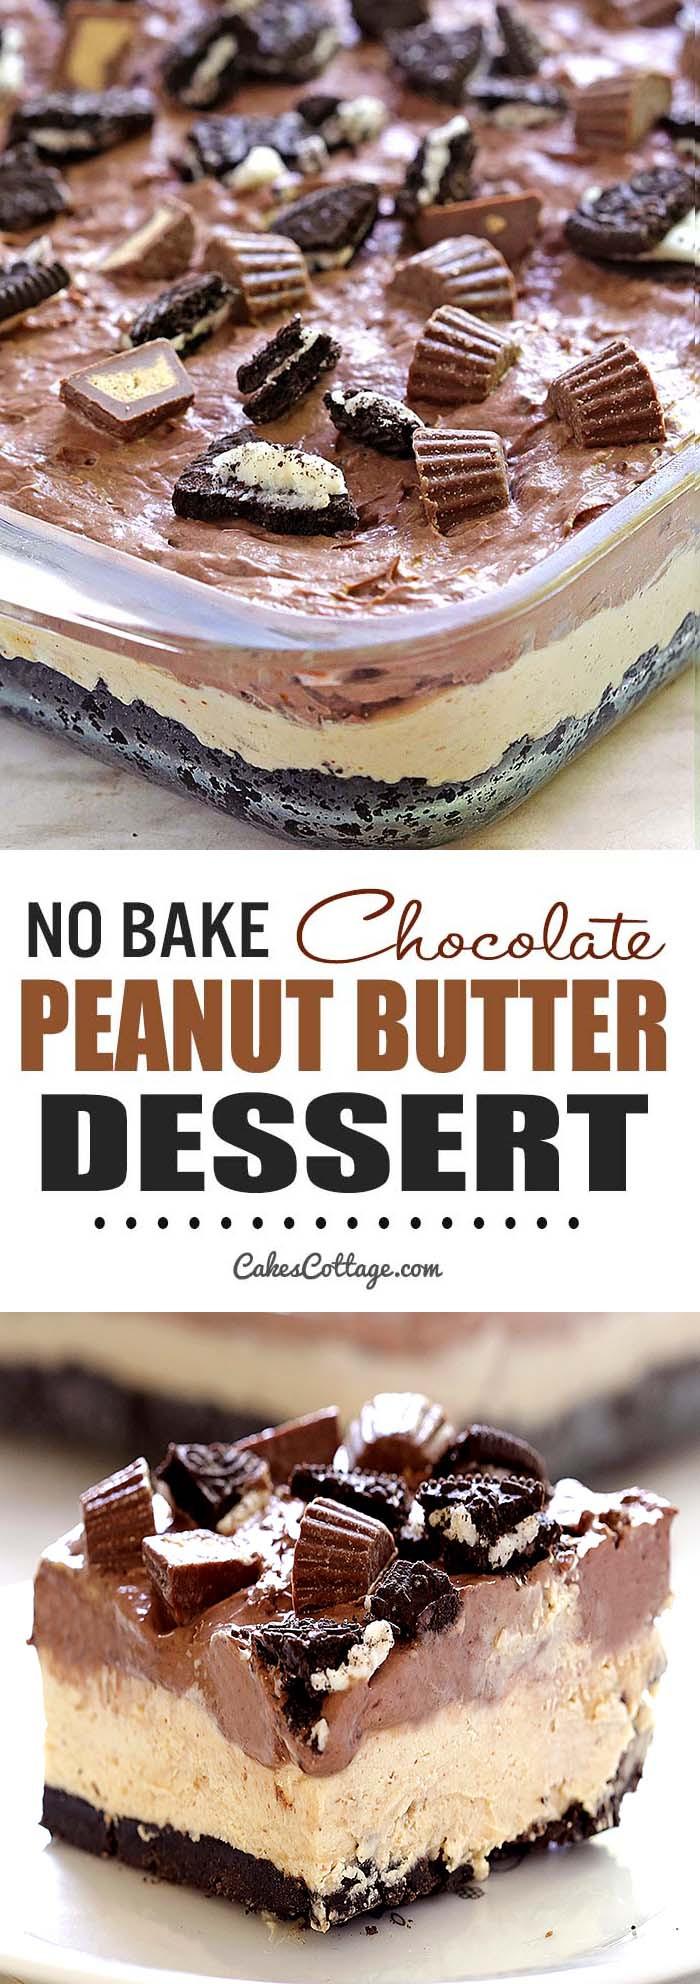 No Bake Chocolate Desserts  No Bake Chocolate Peanut Butter Dessert Cakescottage